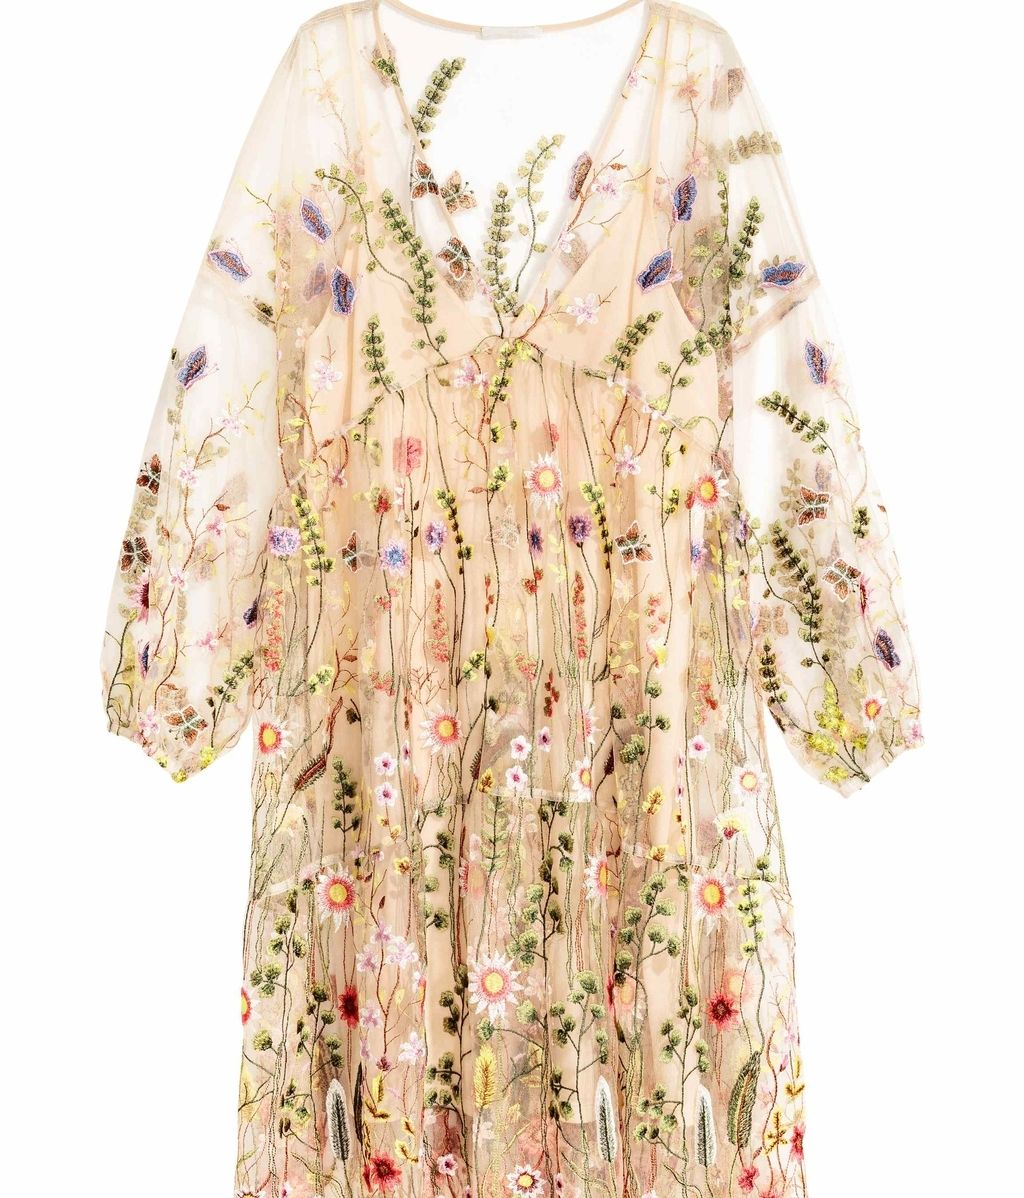 Vestido bordado de H&M